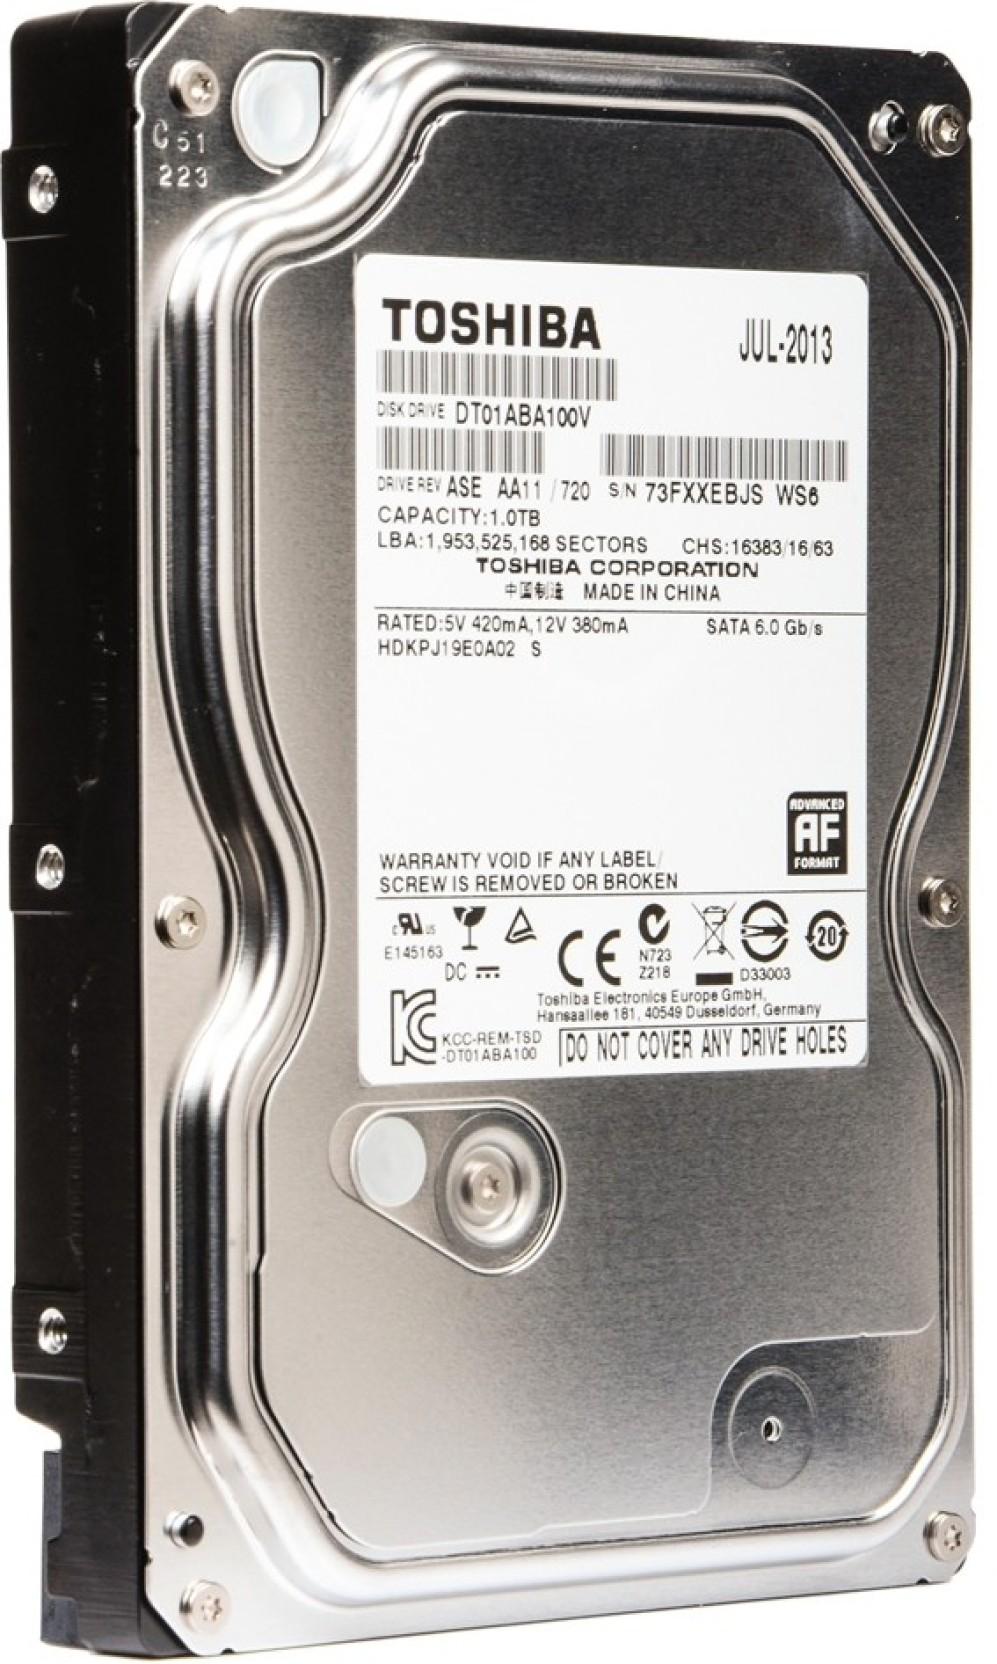 Toshiba Av 1 Tb Desktop Internal Hard Disk Drive Dt01aba100v Hardisk Notebook 1tb 25 Inch Sata Add To Cart